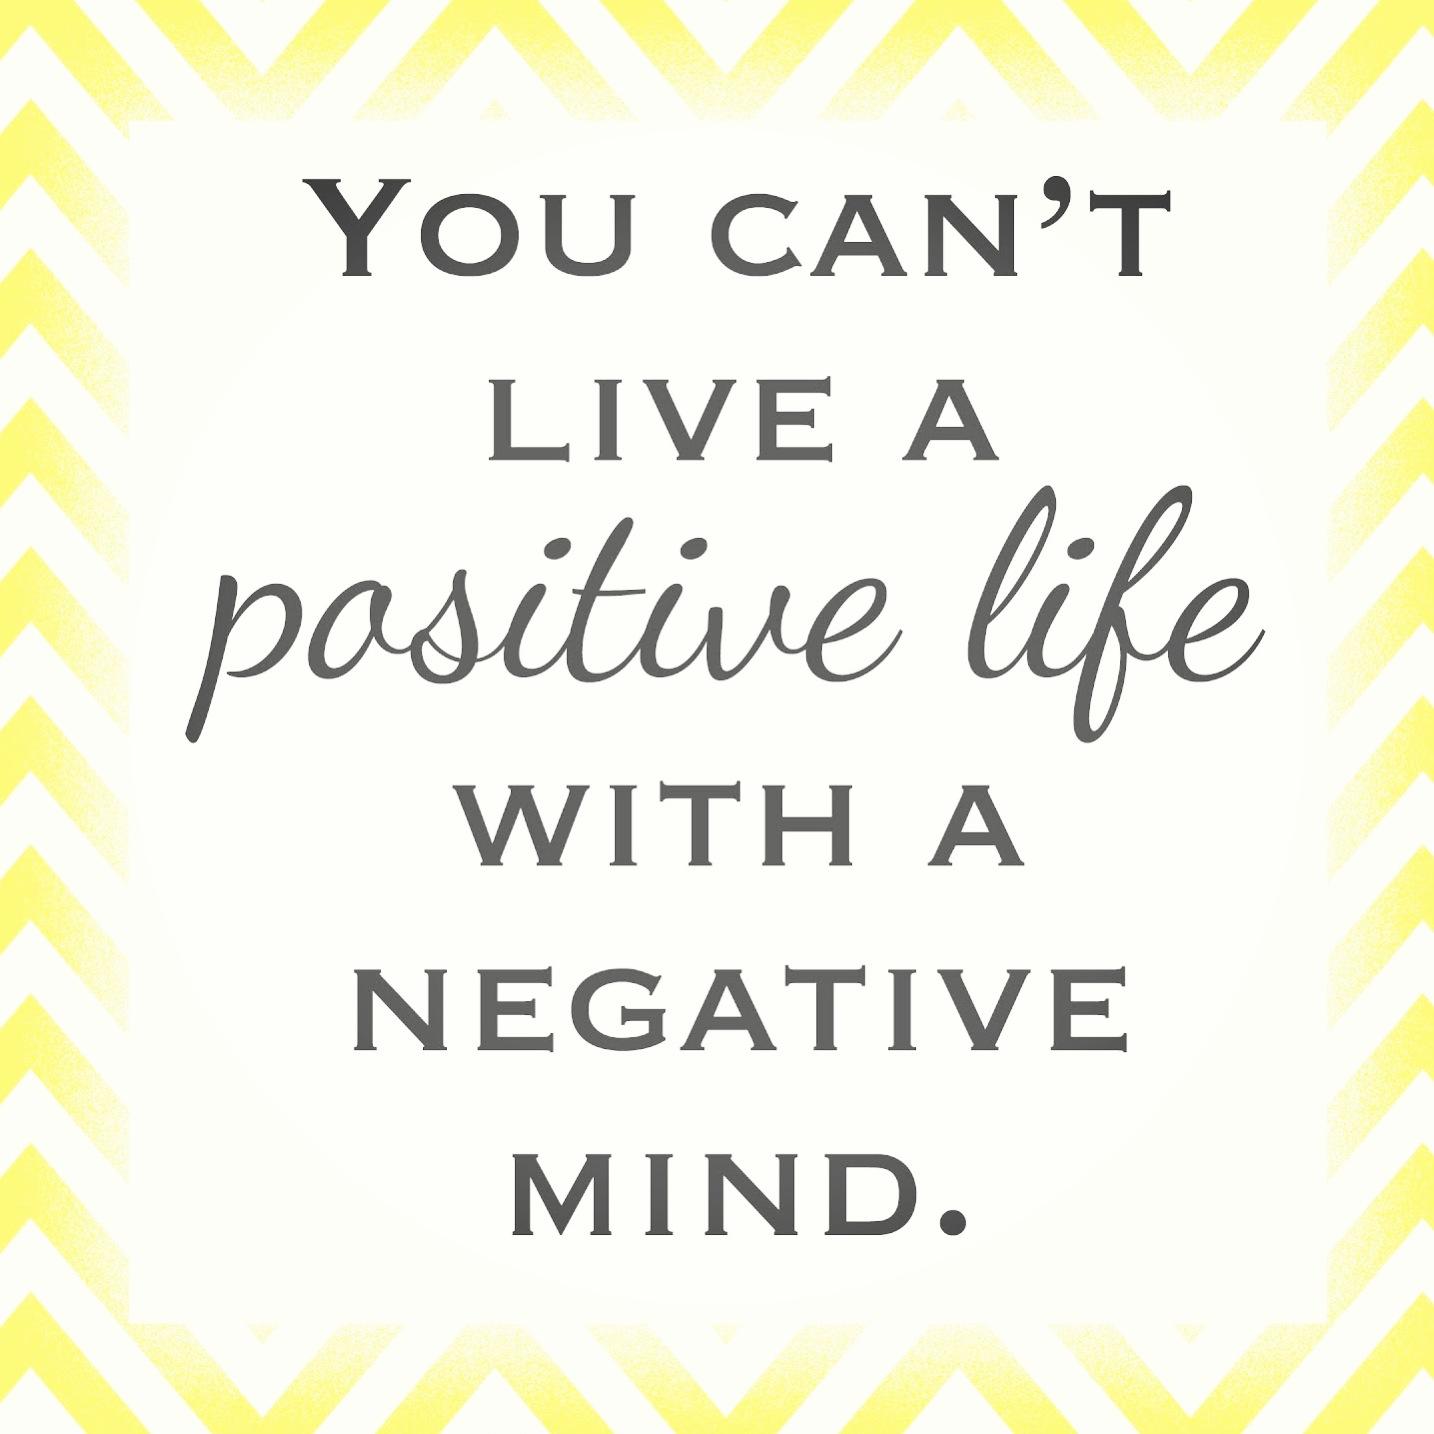 Positive-Life-negative-mind.jpg